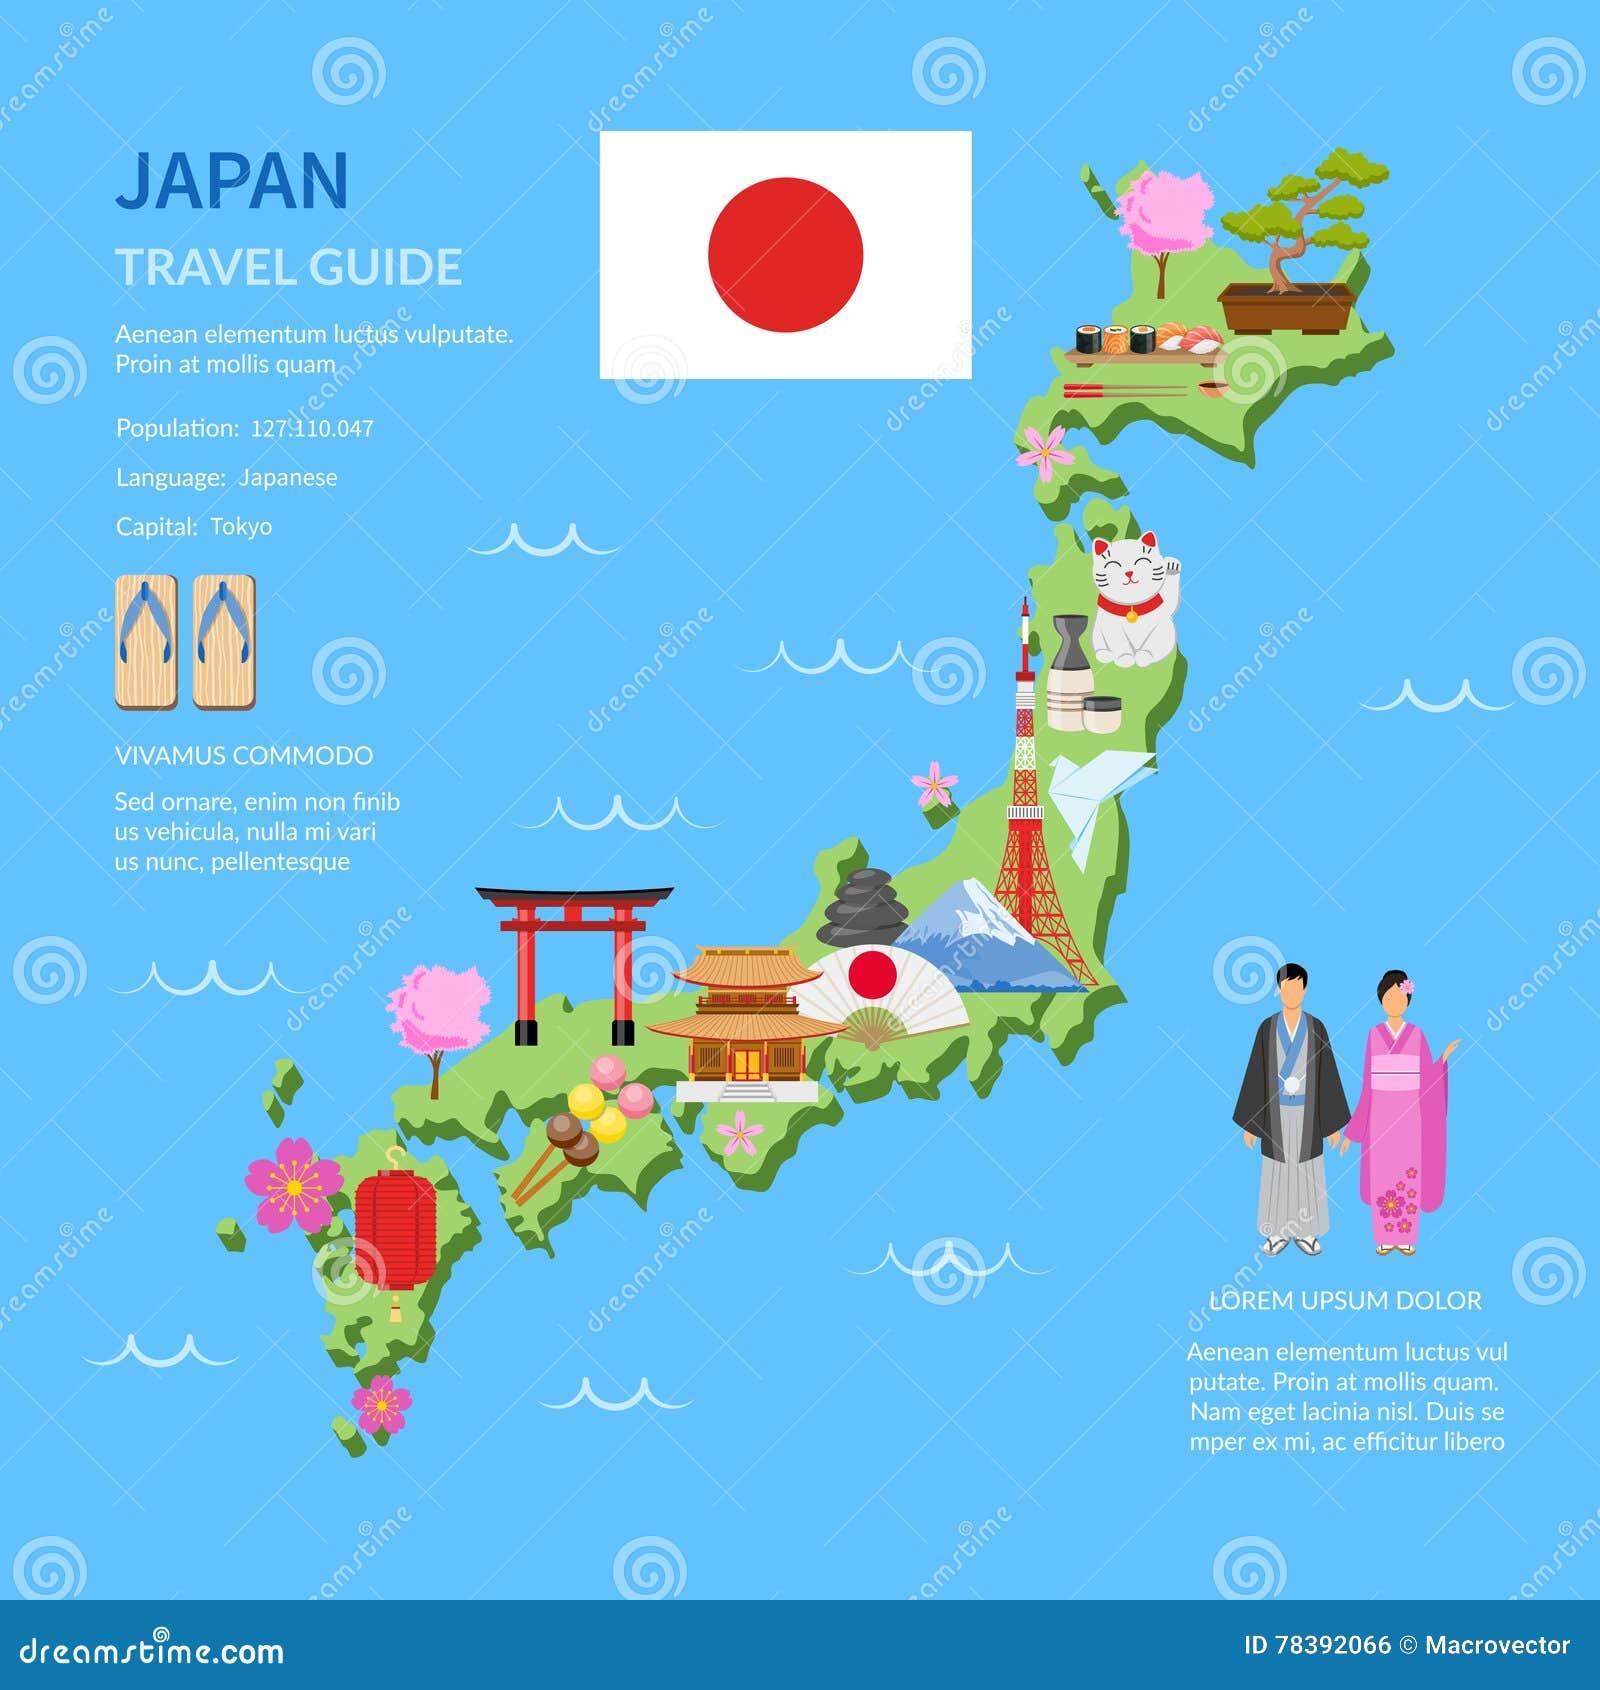 Travel Japan Guide Flat Map Poster Illustration Megapixl - Japan map poster